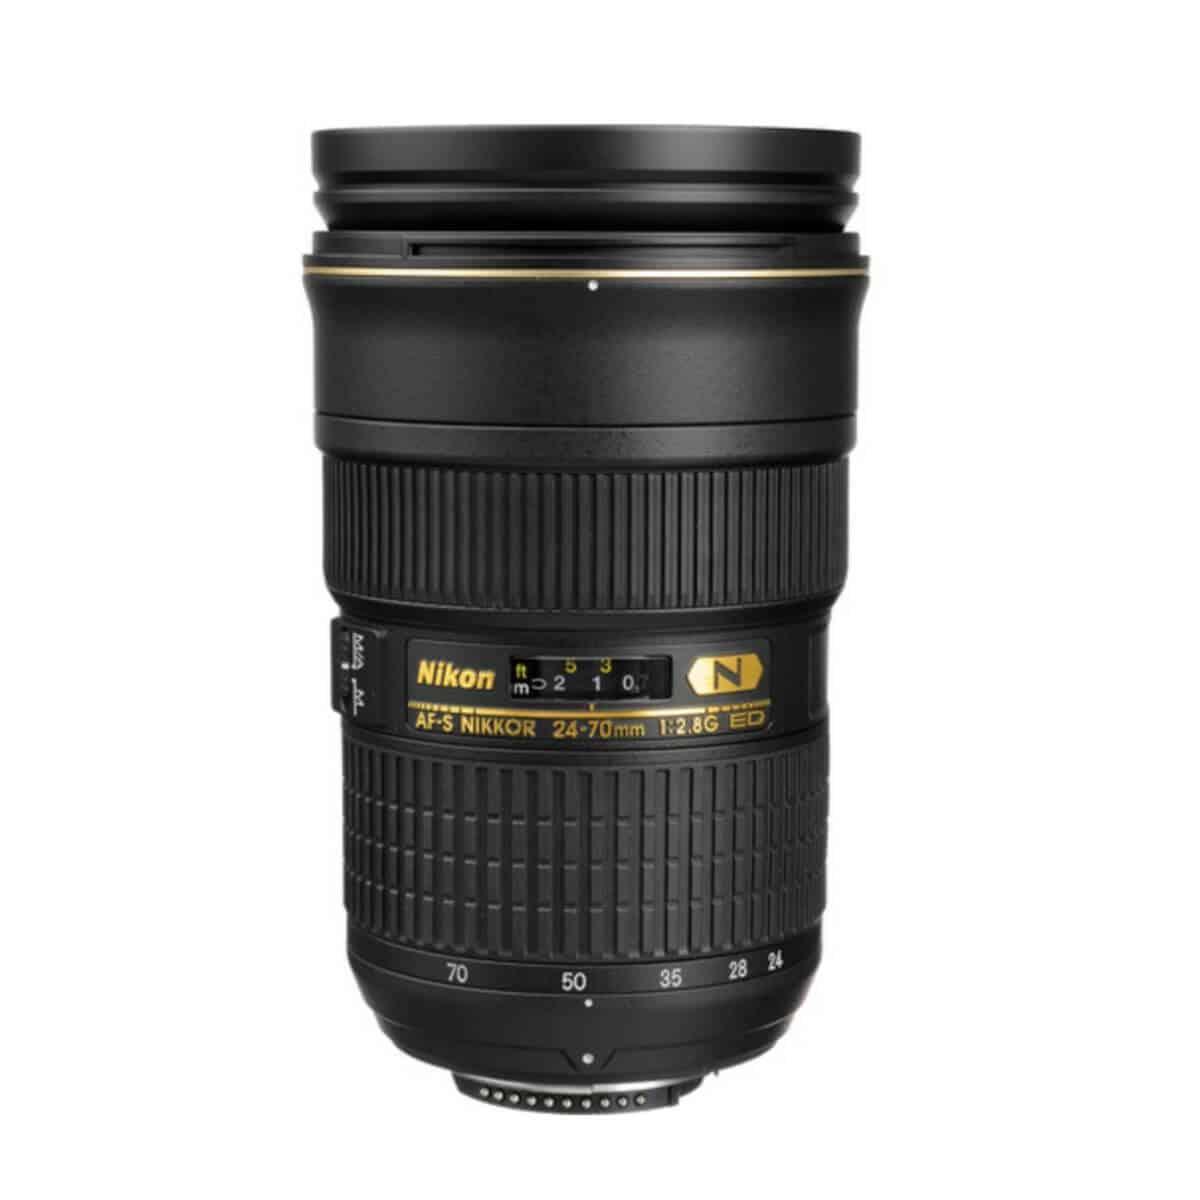 Nikon 24 to 70mm lens.